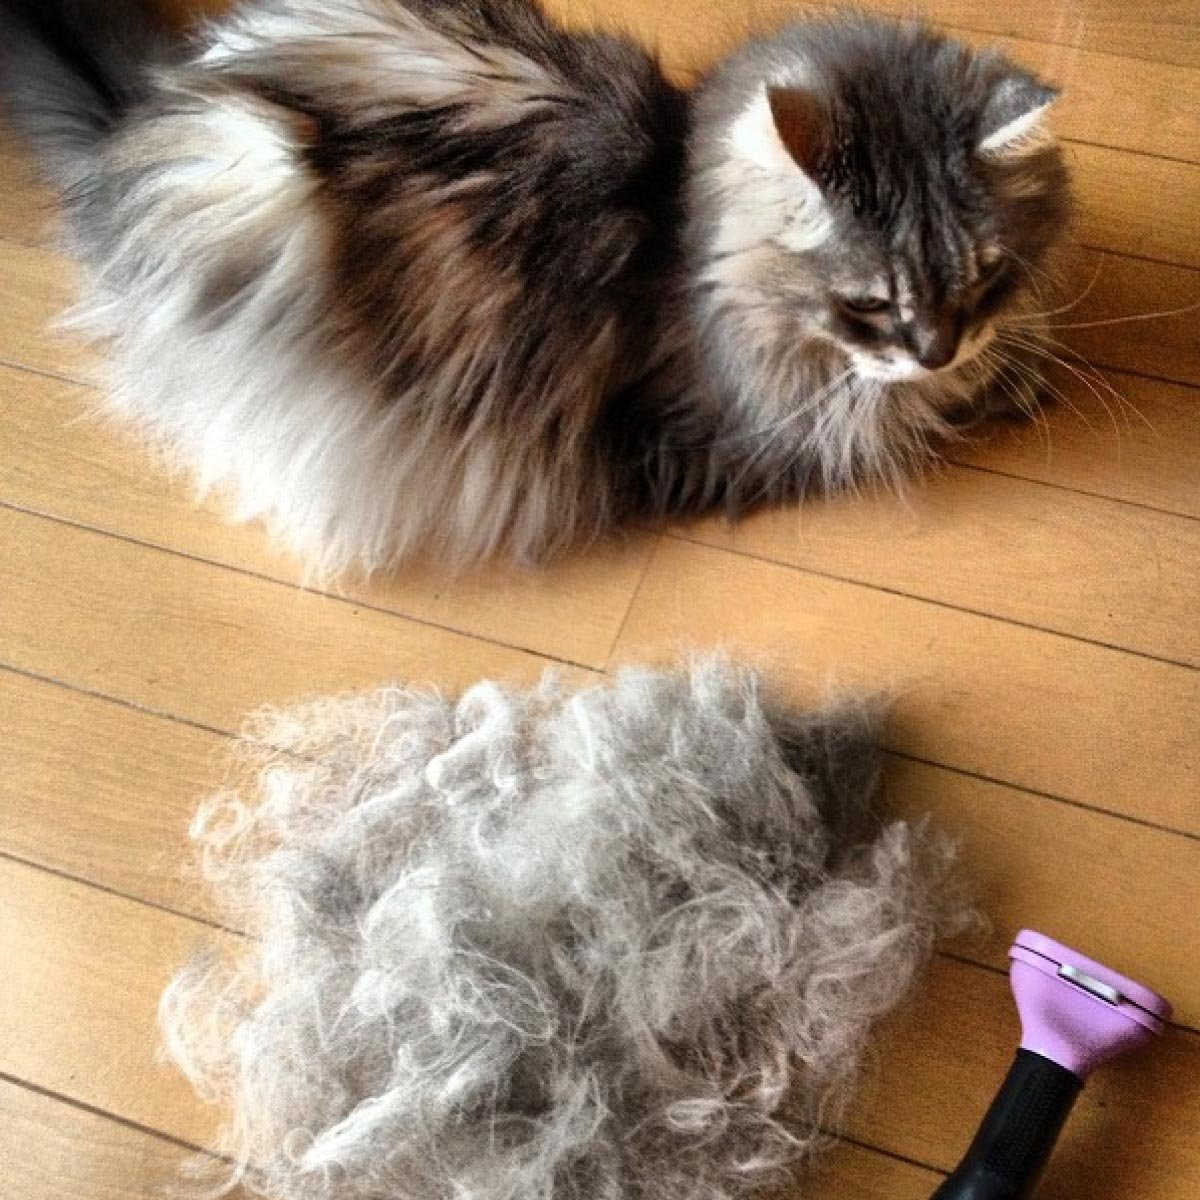 FURminator Long-Hair deShedding Tool for Cats, Brush for Cats, Kittens [Misc.] by Furminator